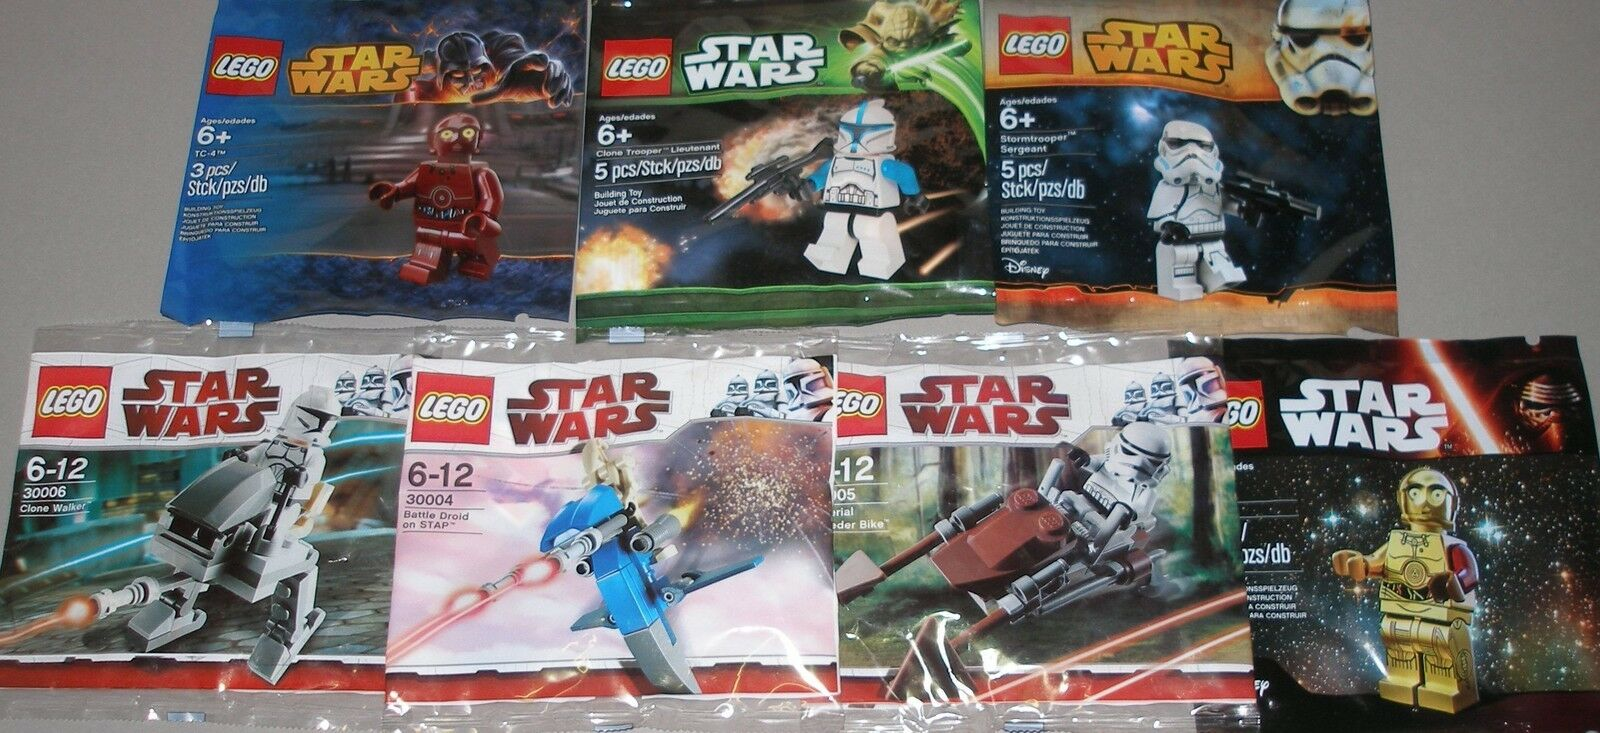 7x LEGO Star Wars 2x Stormtrooper, 2x Clonetrooper, Battle droide, tc-4, c3po